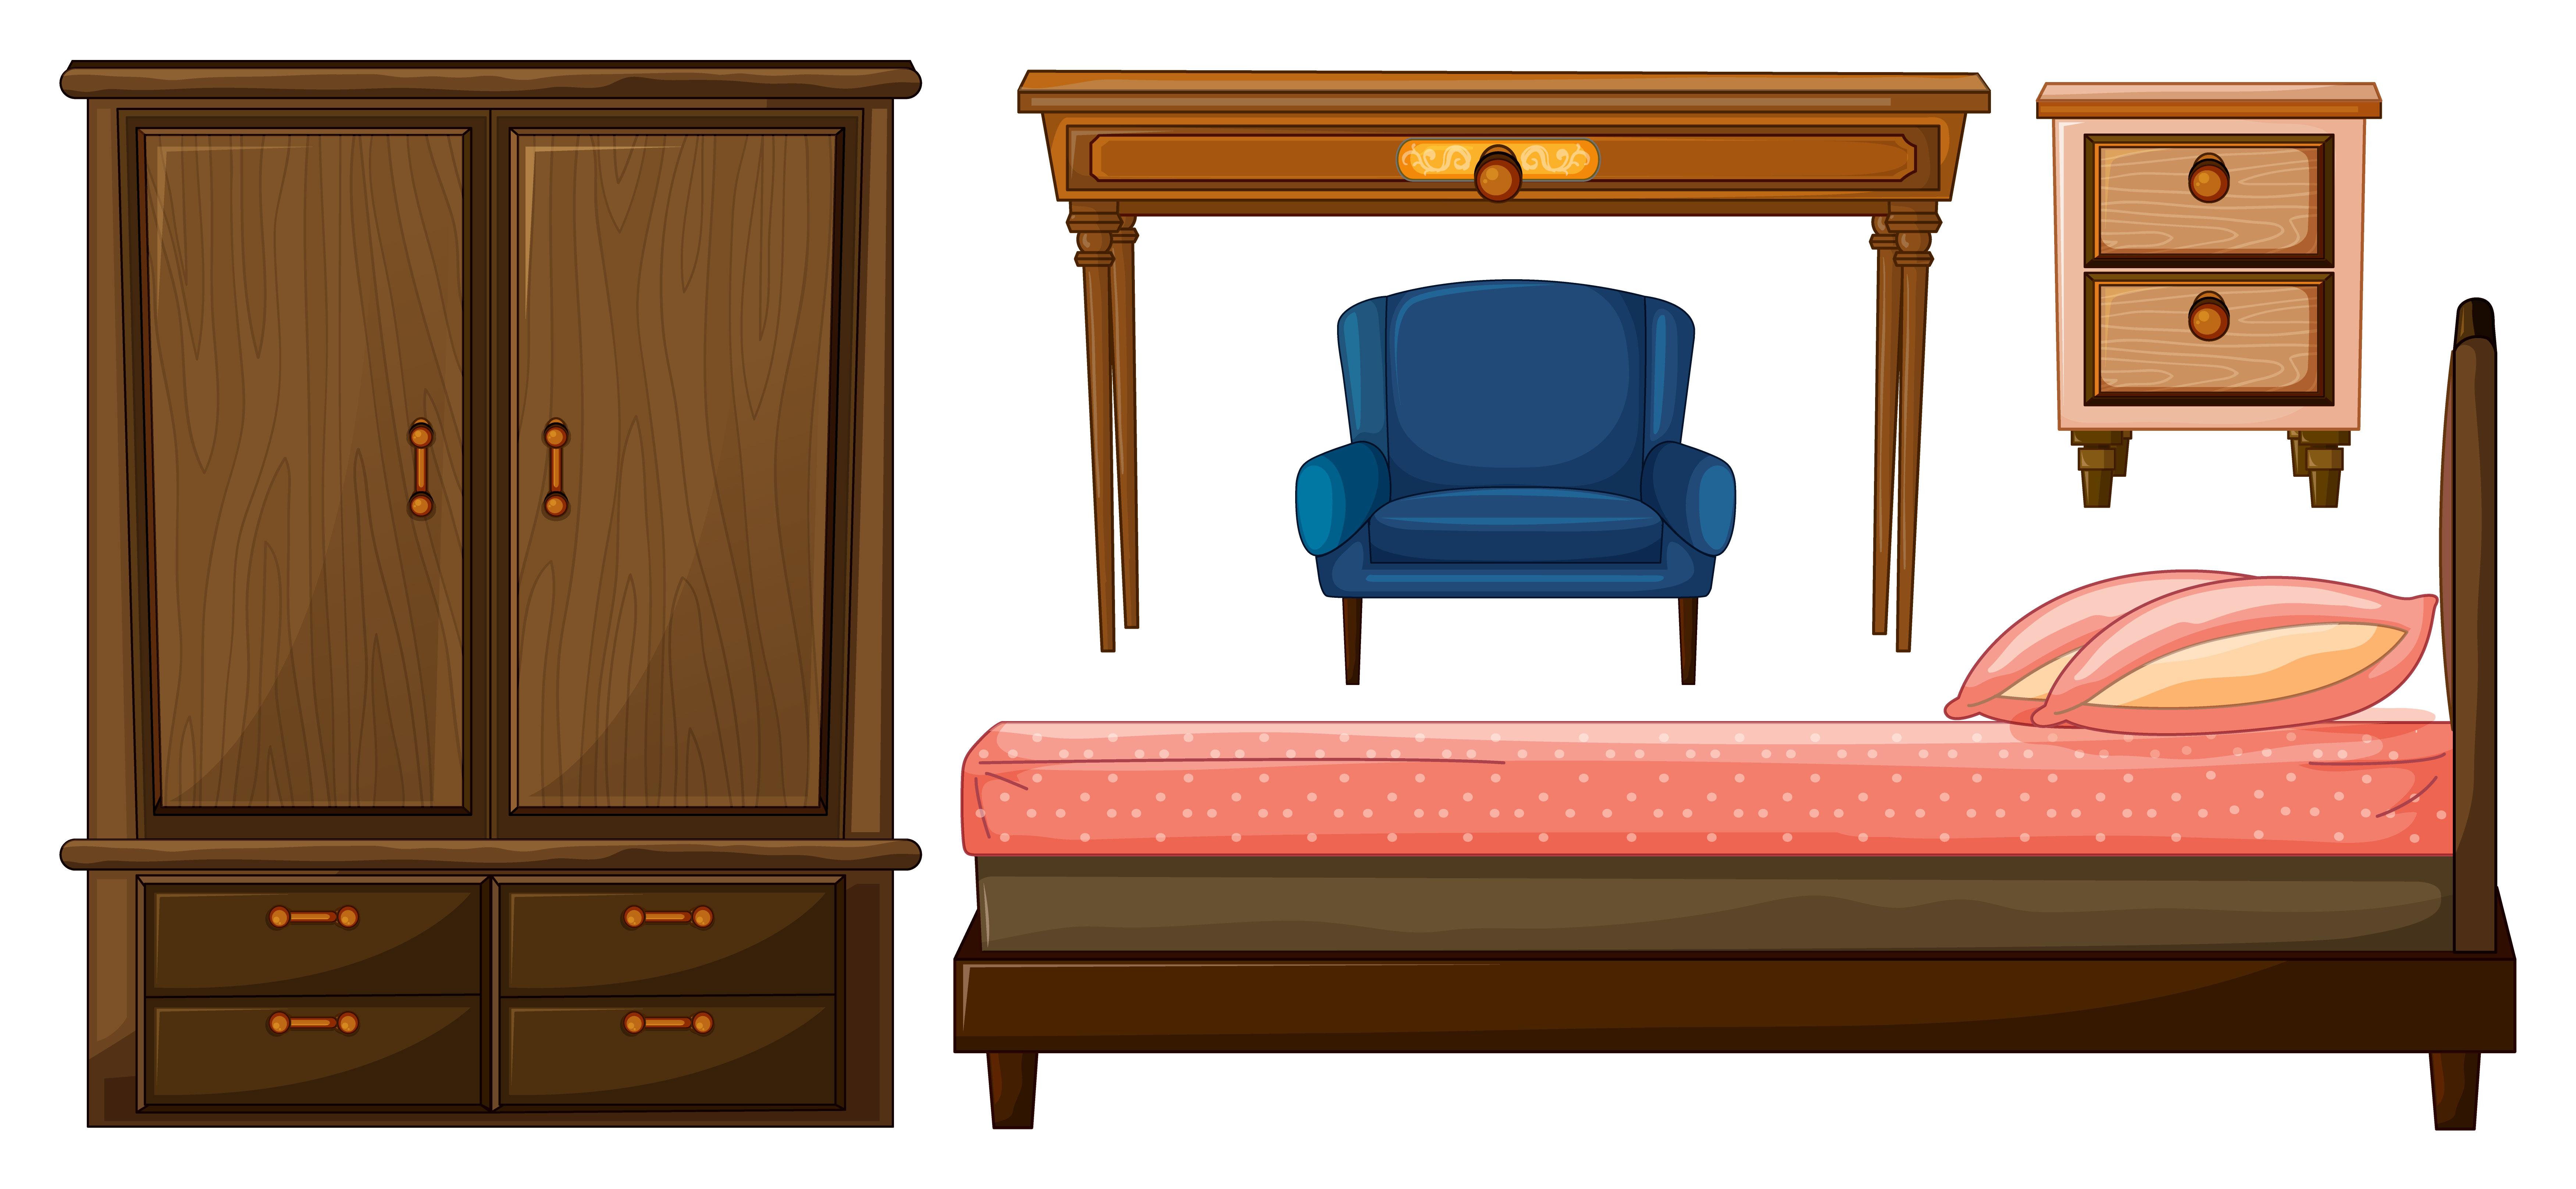 Bedroom Furnitures Download Free Vectors Clipart